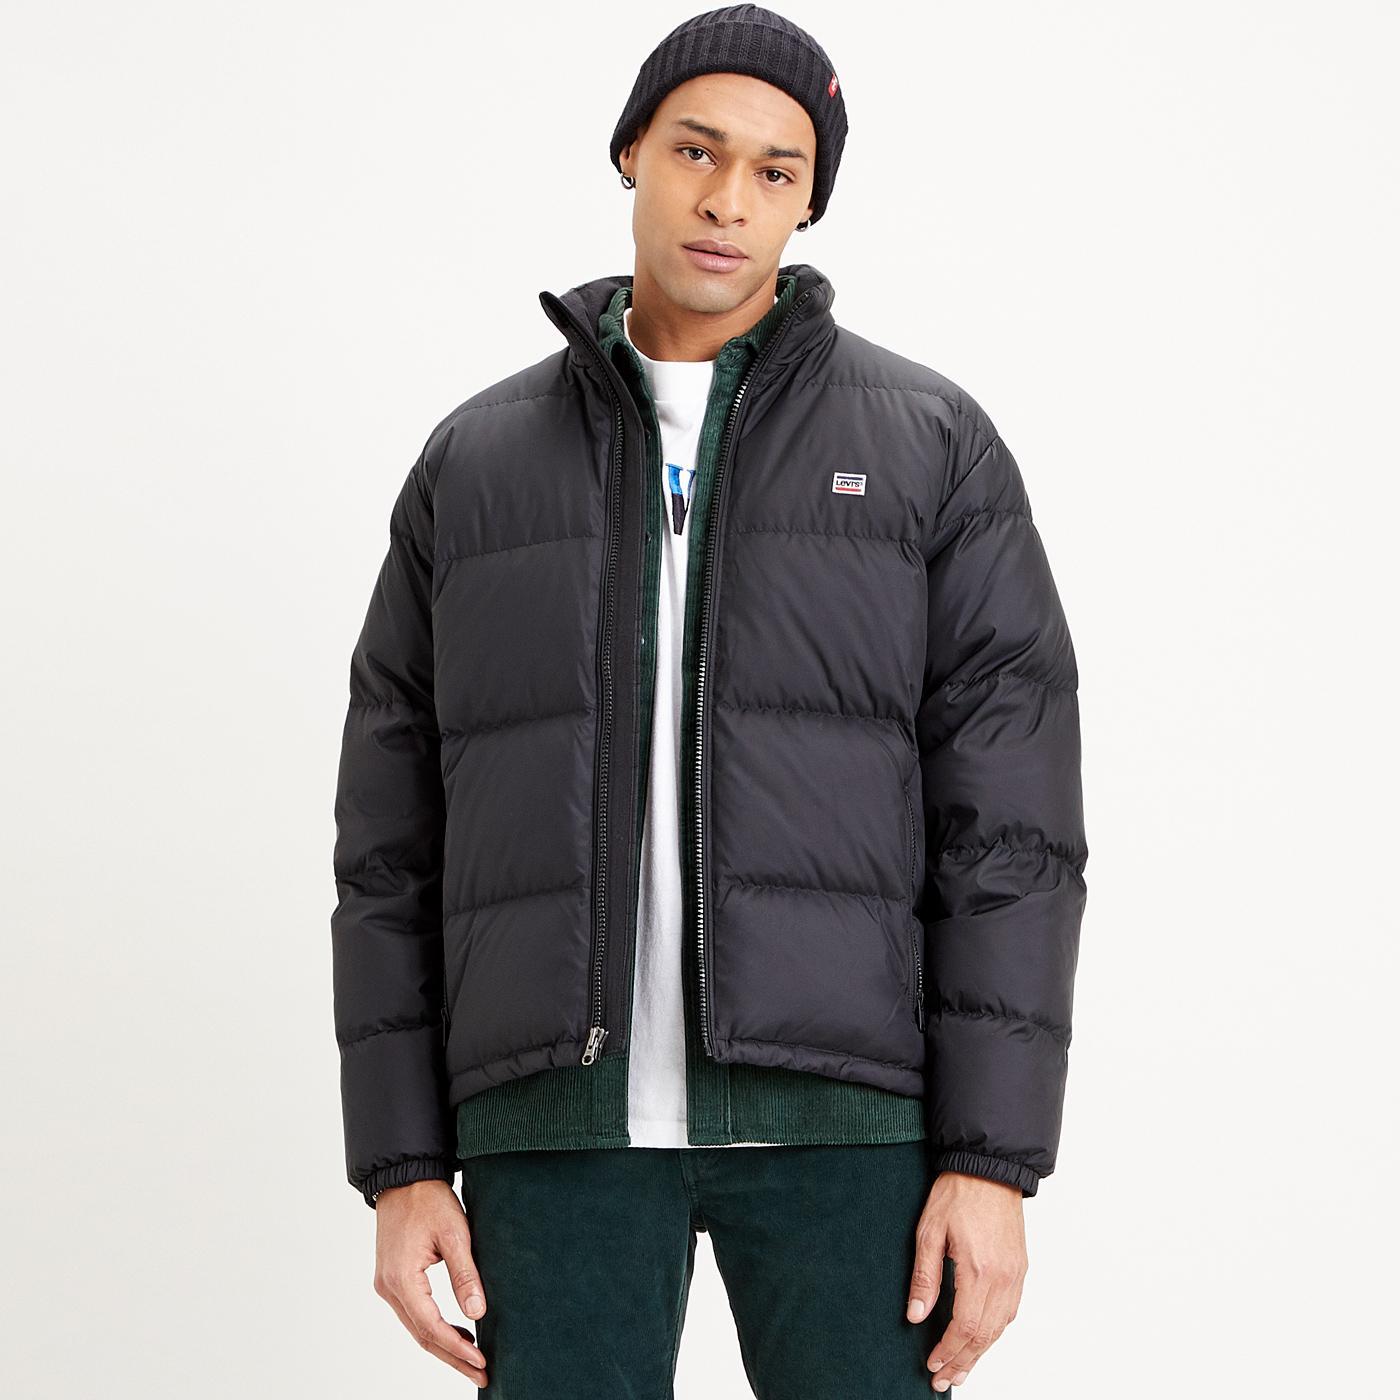 Fillmore LEVI'S Retro Down Filled Puffer Jacket JB